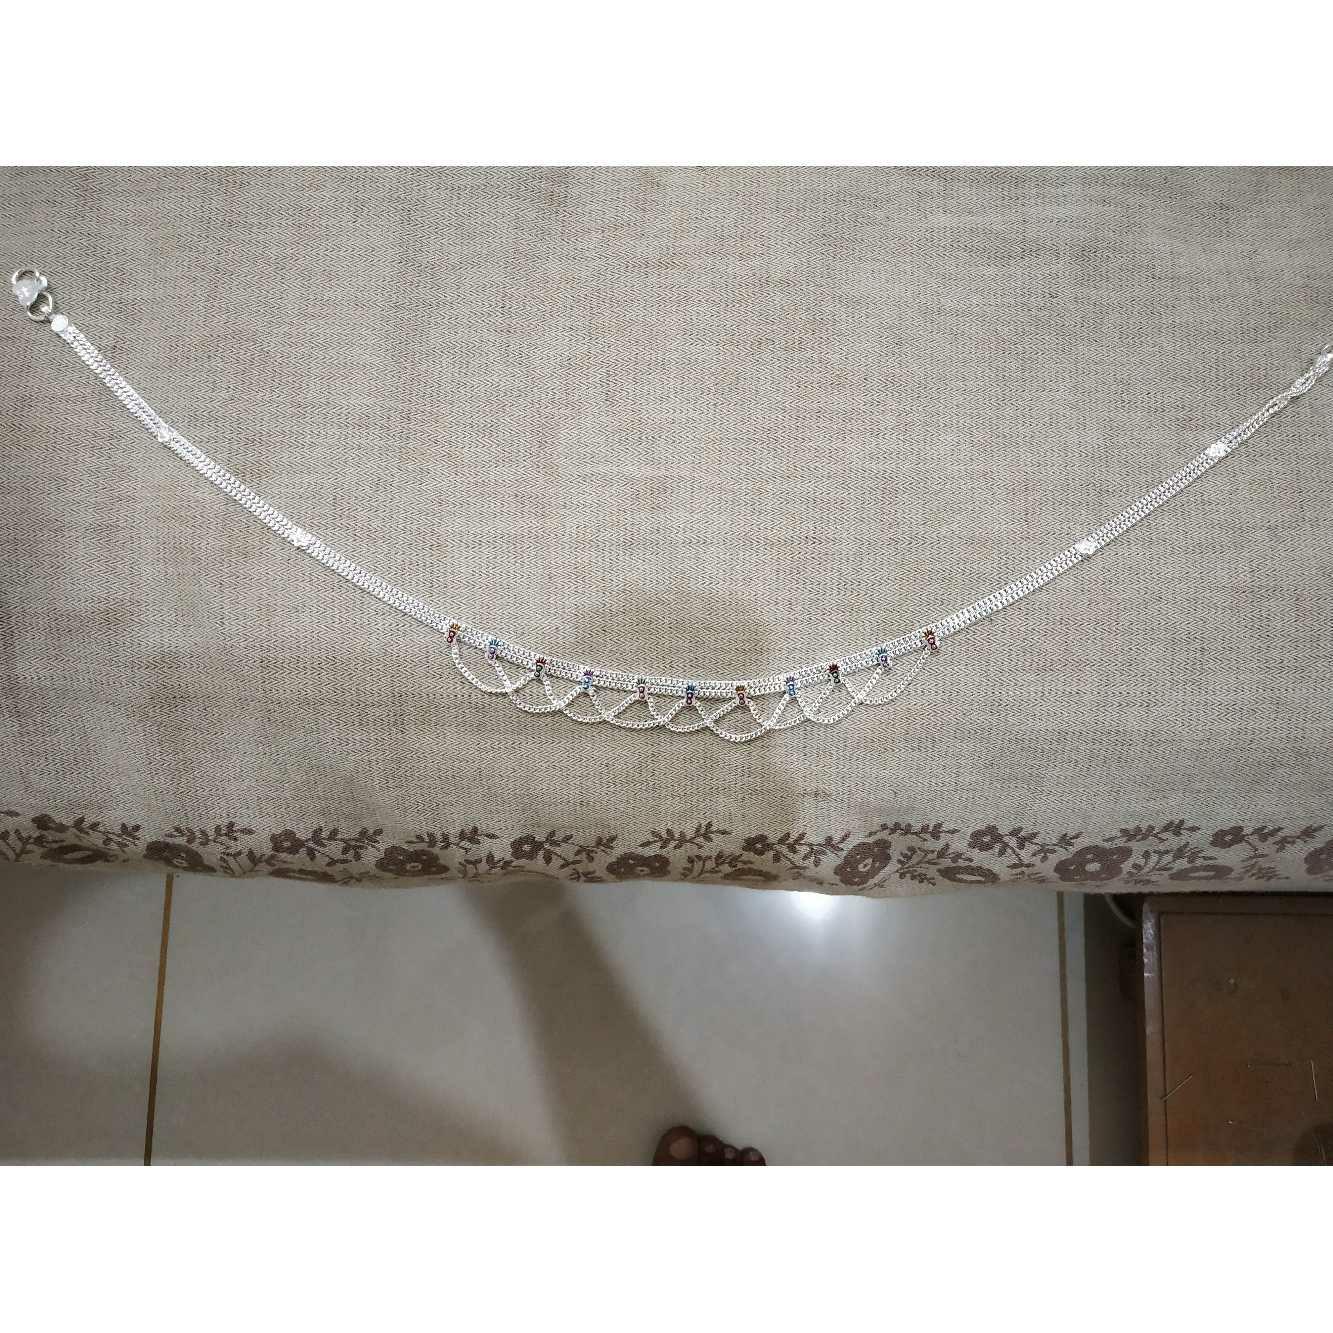 Dabal(Two 2) Line Kadap Chain Middle Jula Mina Chol Nakshi Aagra Baccha(Small Size) Kandora